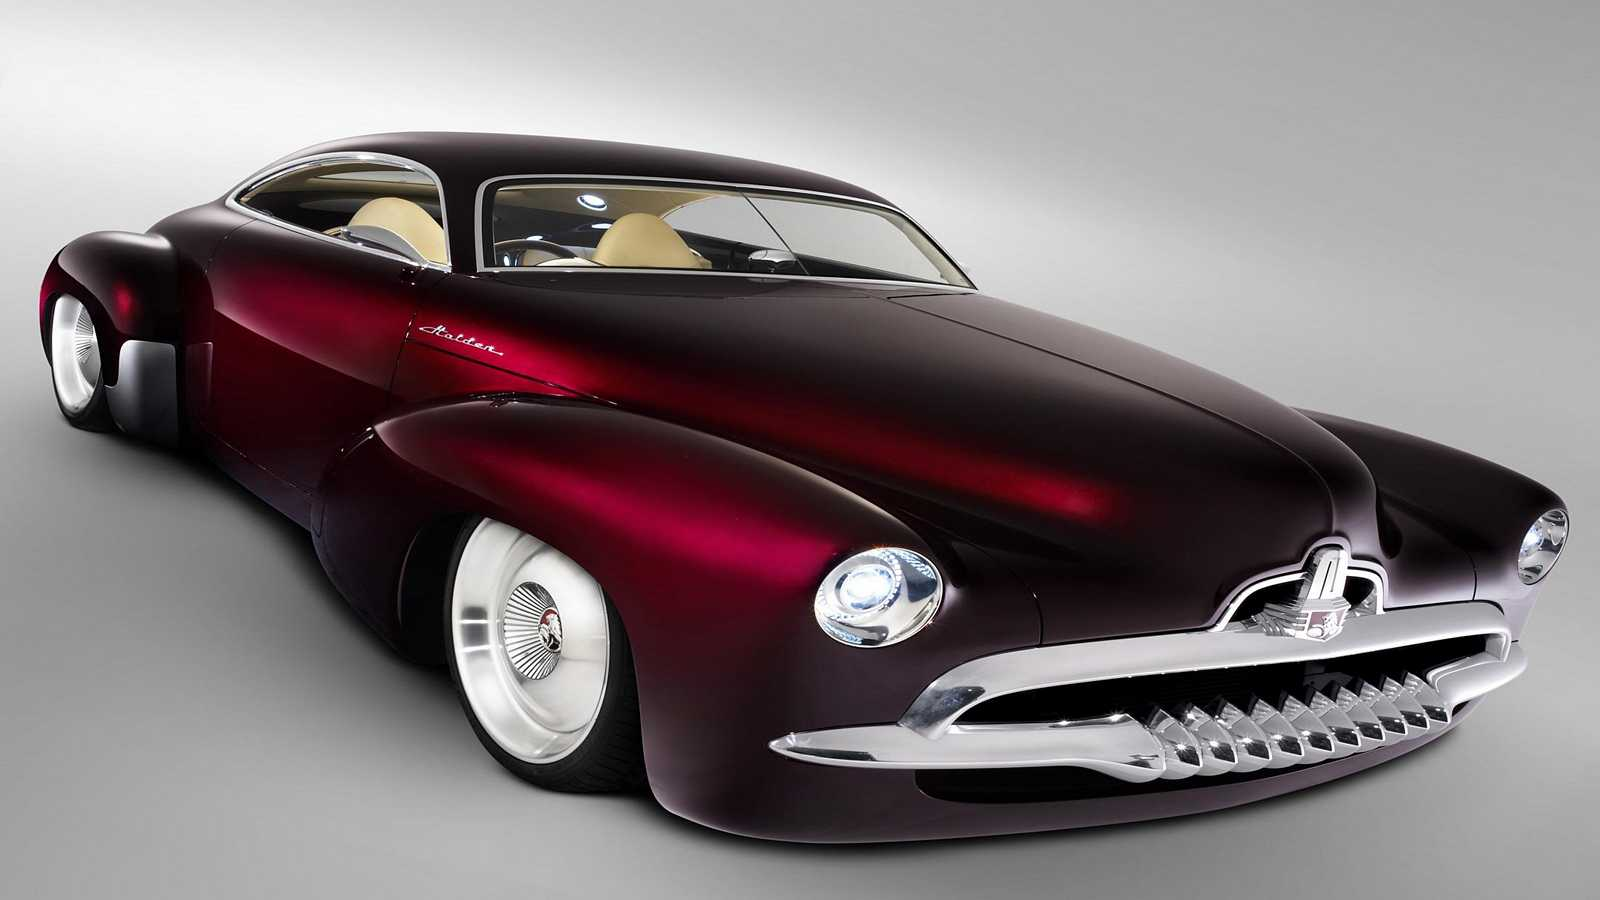 http://3.bp.blogspot.com/-oumsyHifieo/UNh4Mq17S9I/AAAAAAAAvSU/TVDAWsidRIk/s1600/1600x900+Wallpaper+-+Auto+-+cars_0006.jpg